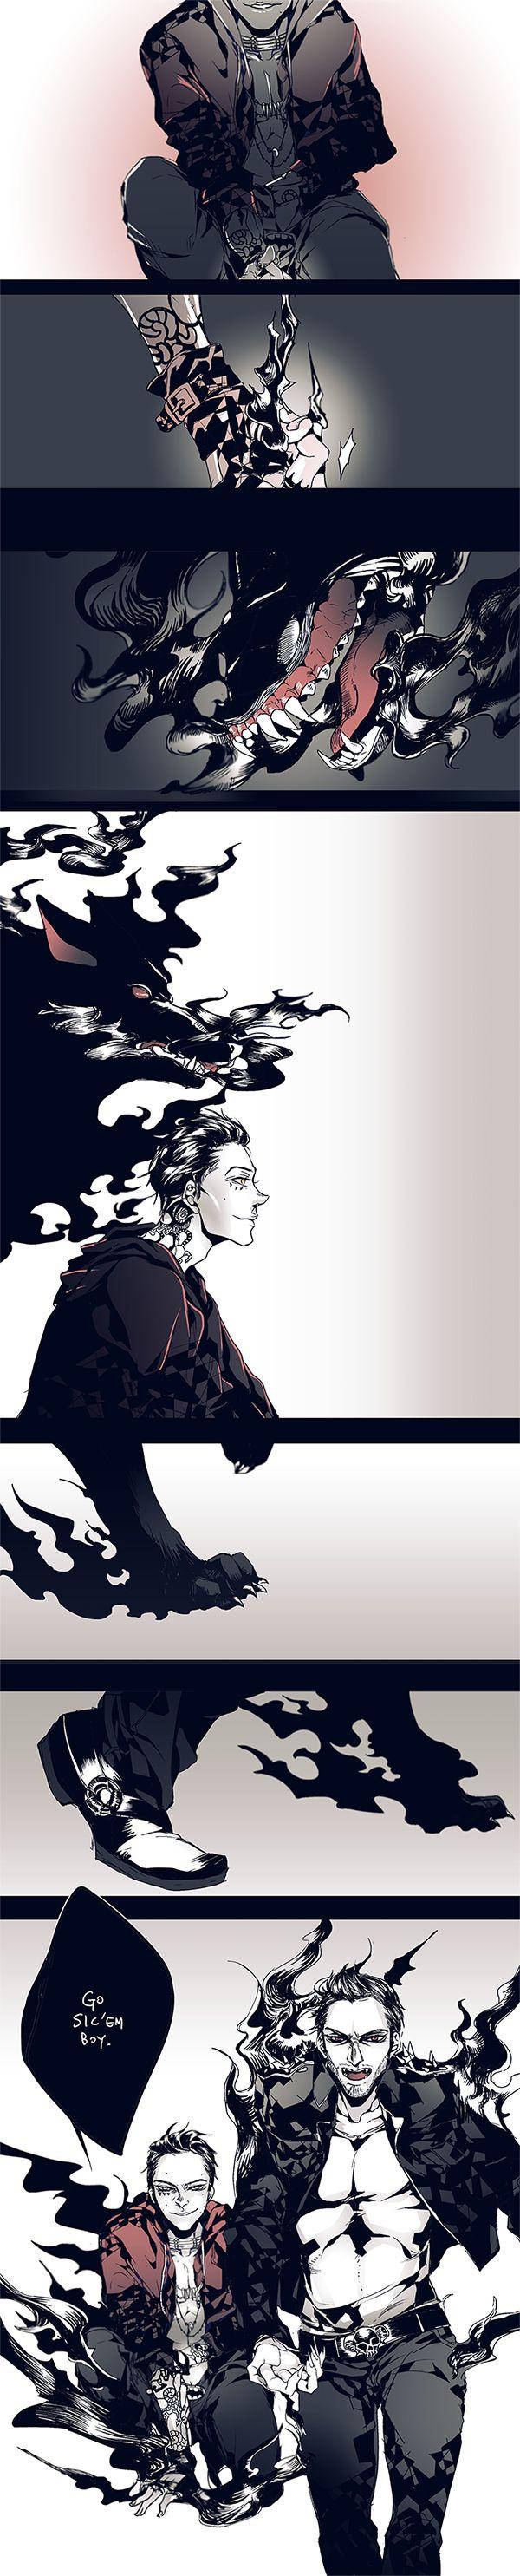 """I am the Fire starter, You are my Flame.""  Demon Summoner!Stiles and Werewolf Derek."